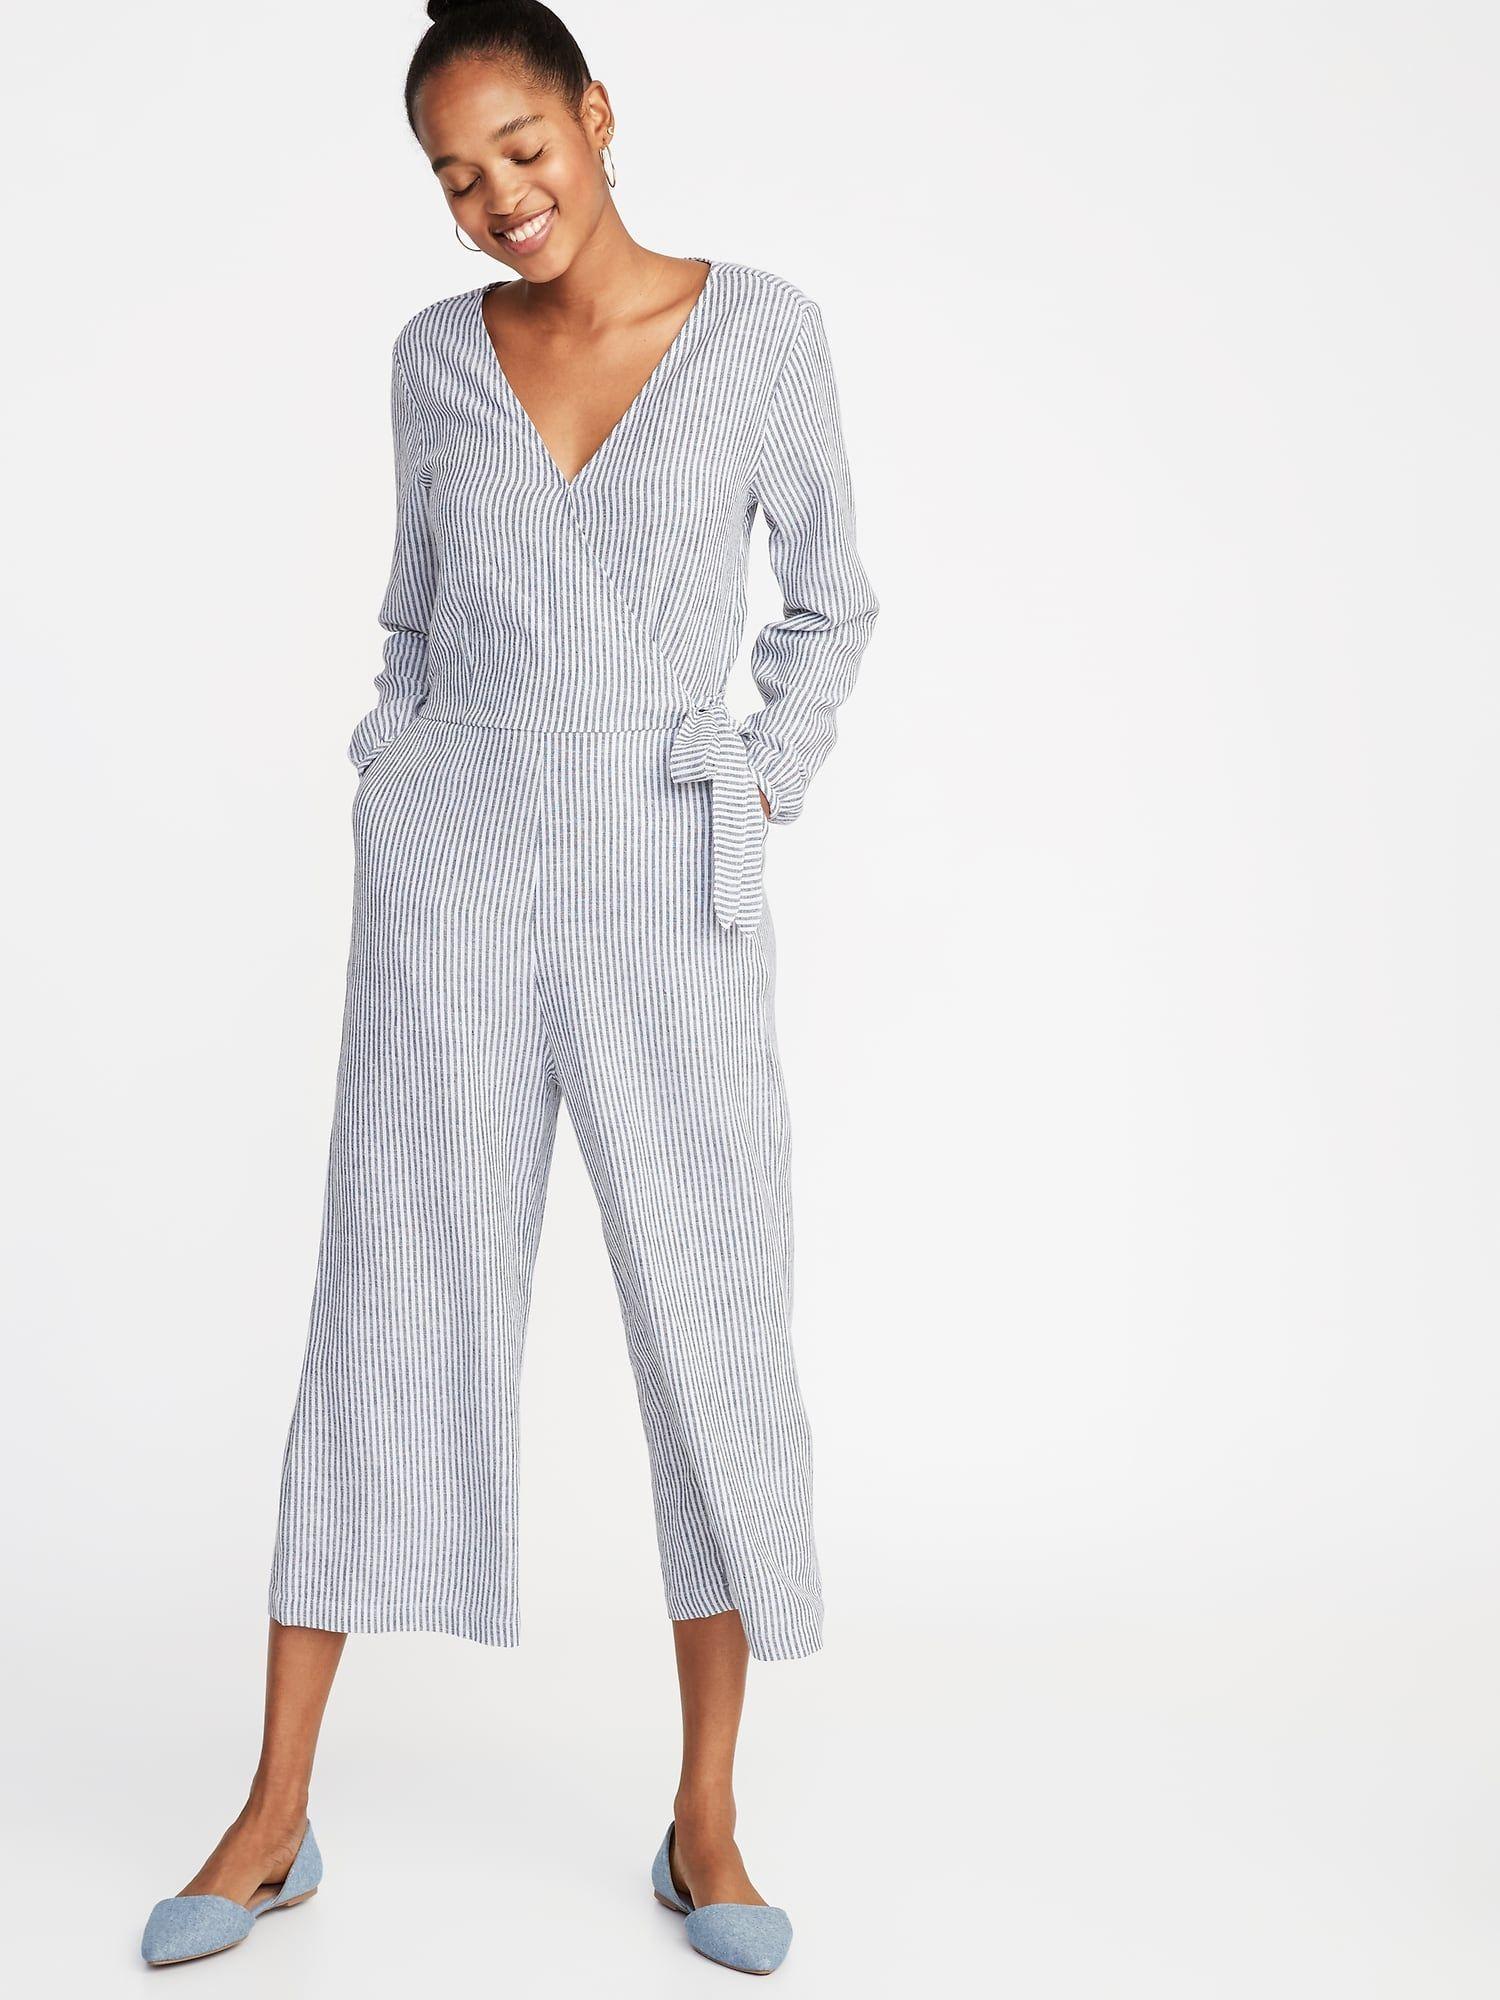 a40ad3b365b17 Waist-Defined Linen-Blend Striped Jumpsuit for Women in 2019 ...